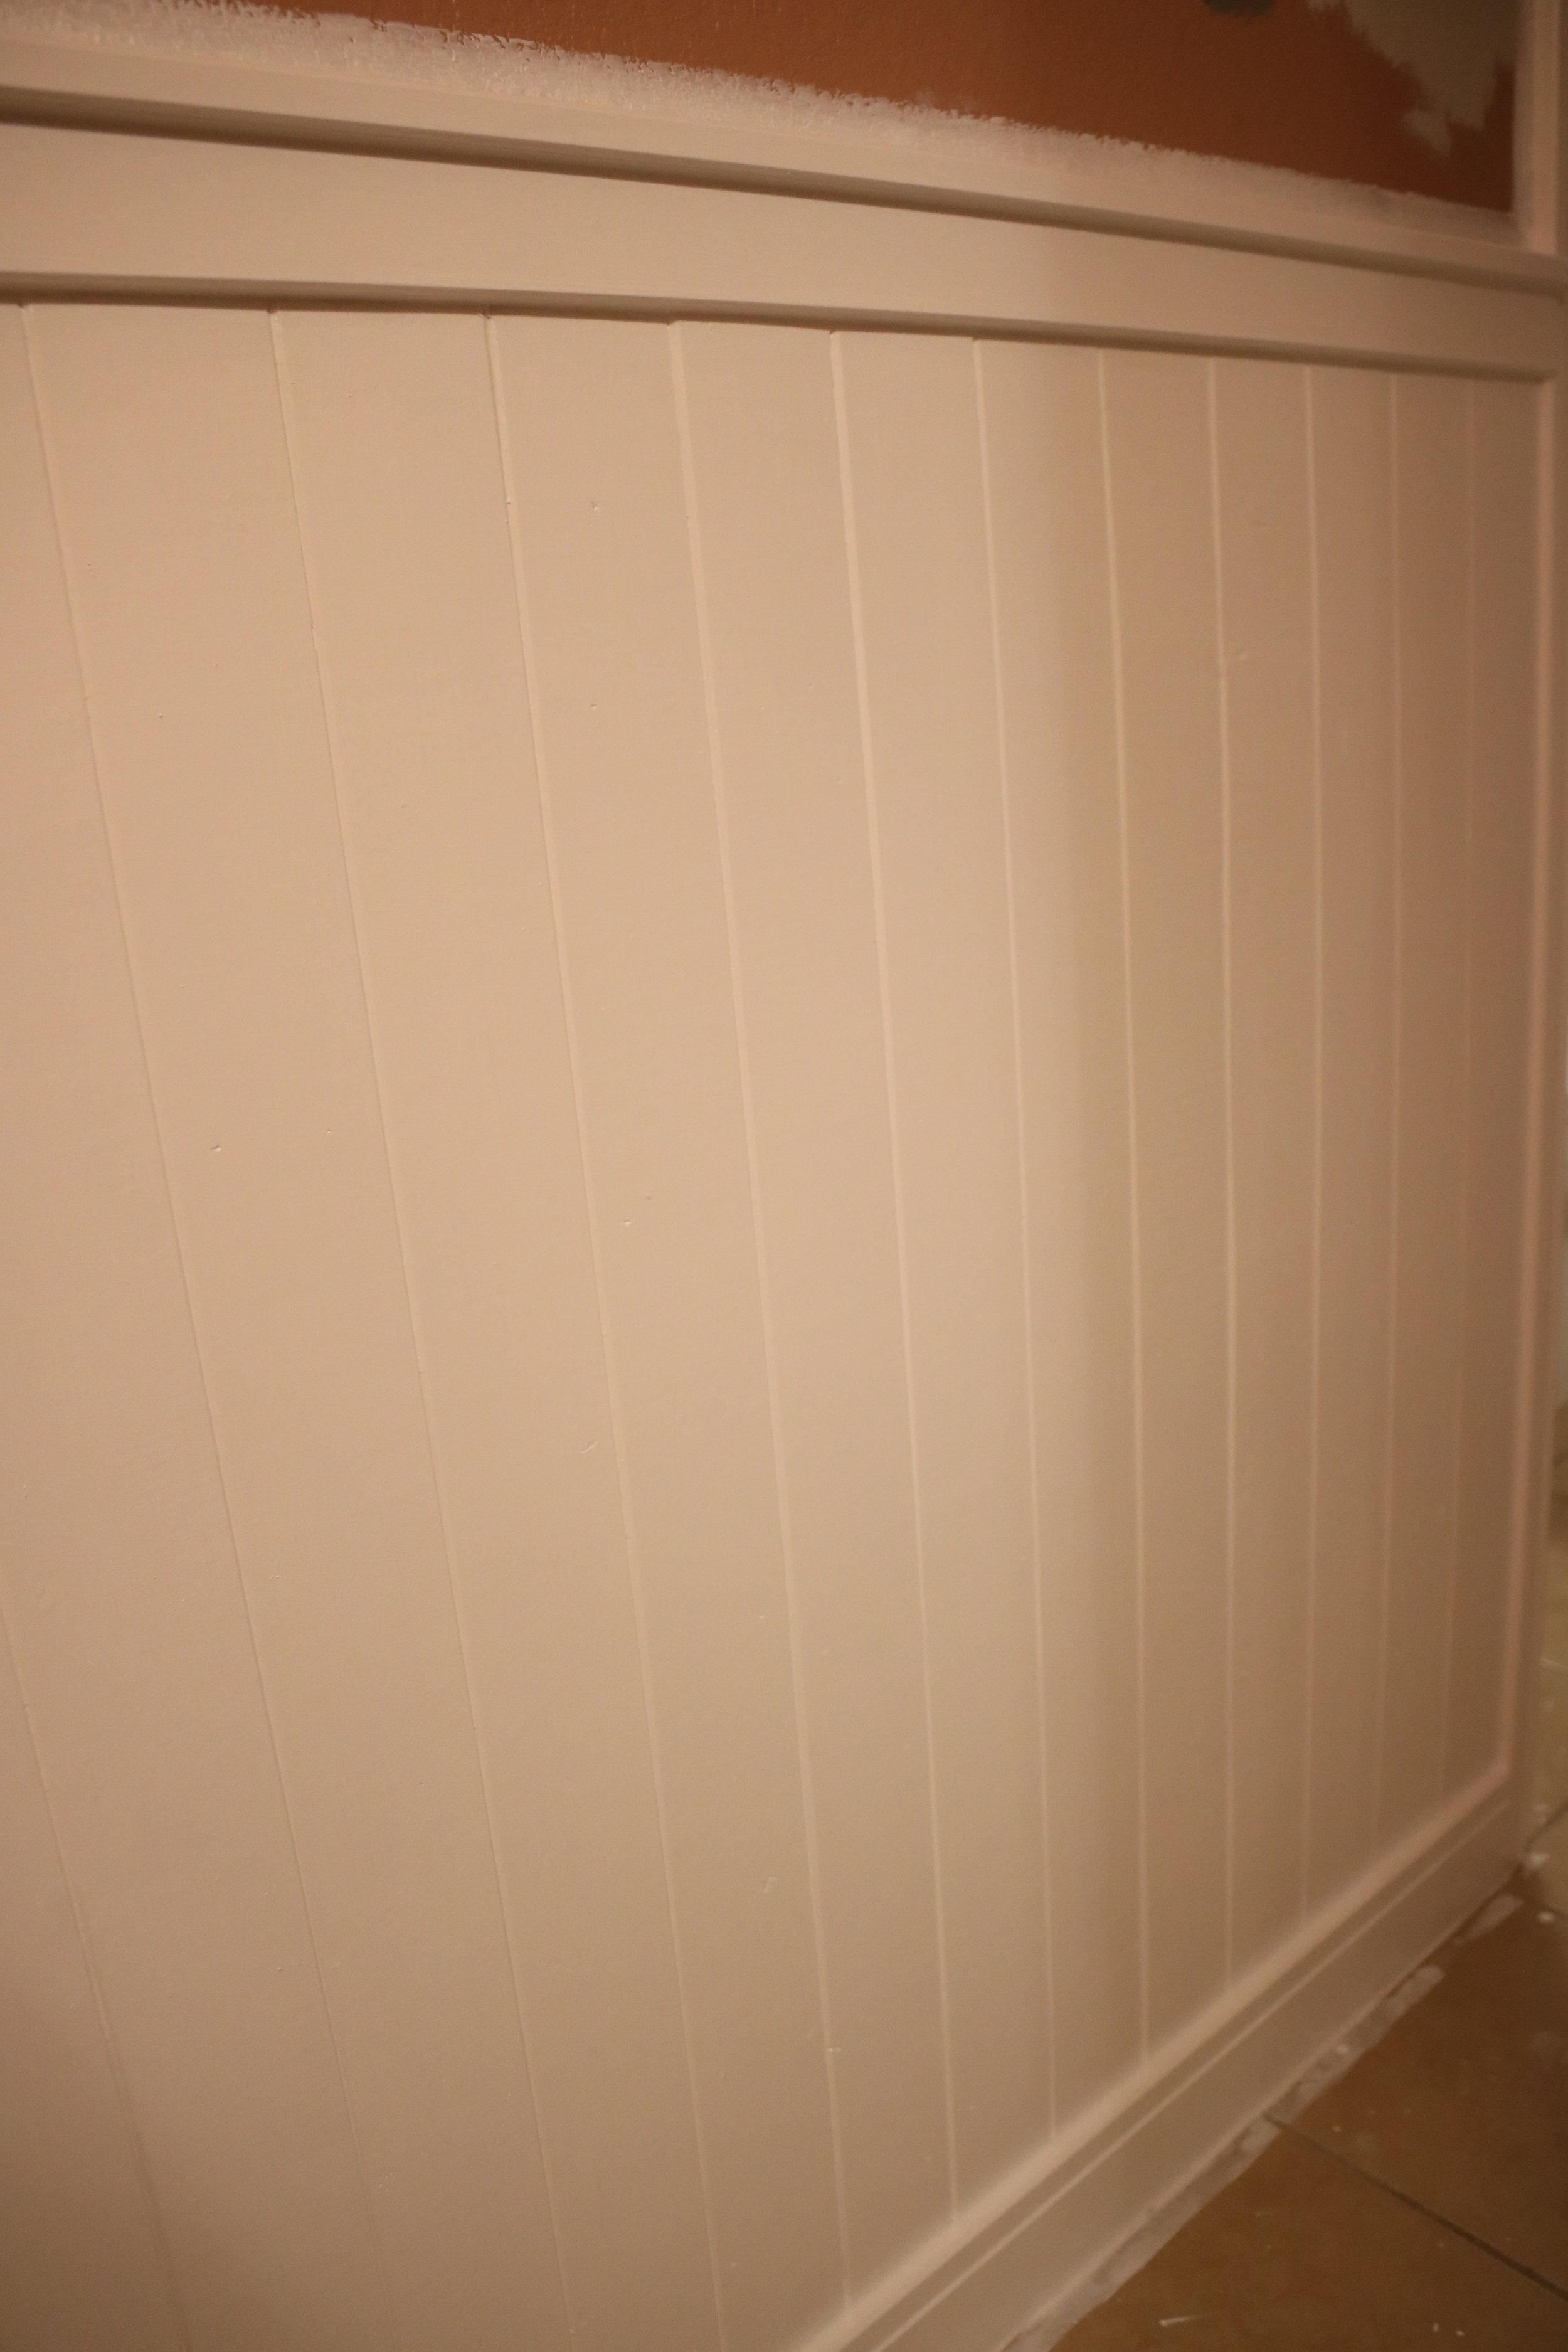 2 coats of white paint